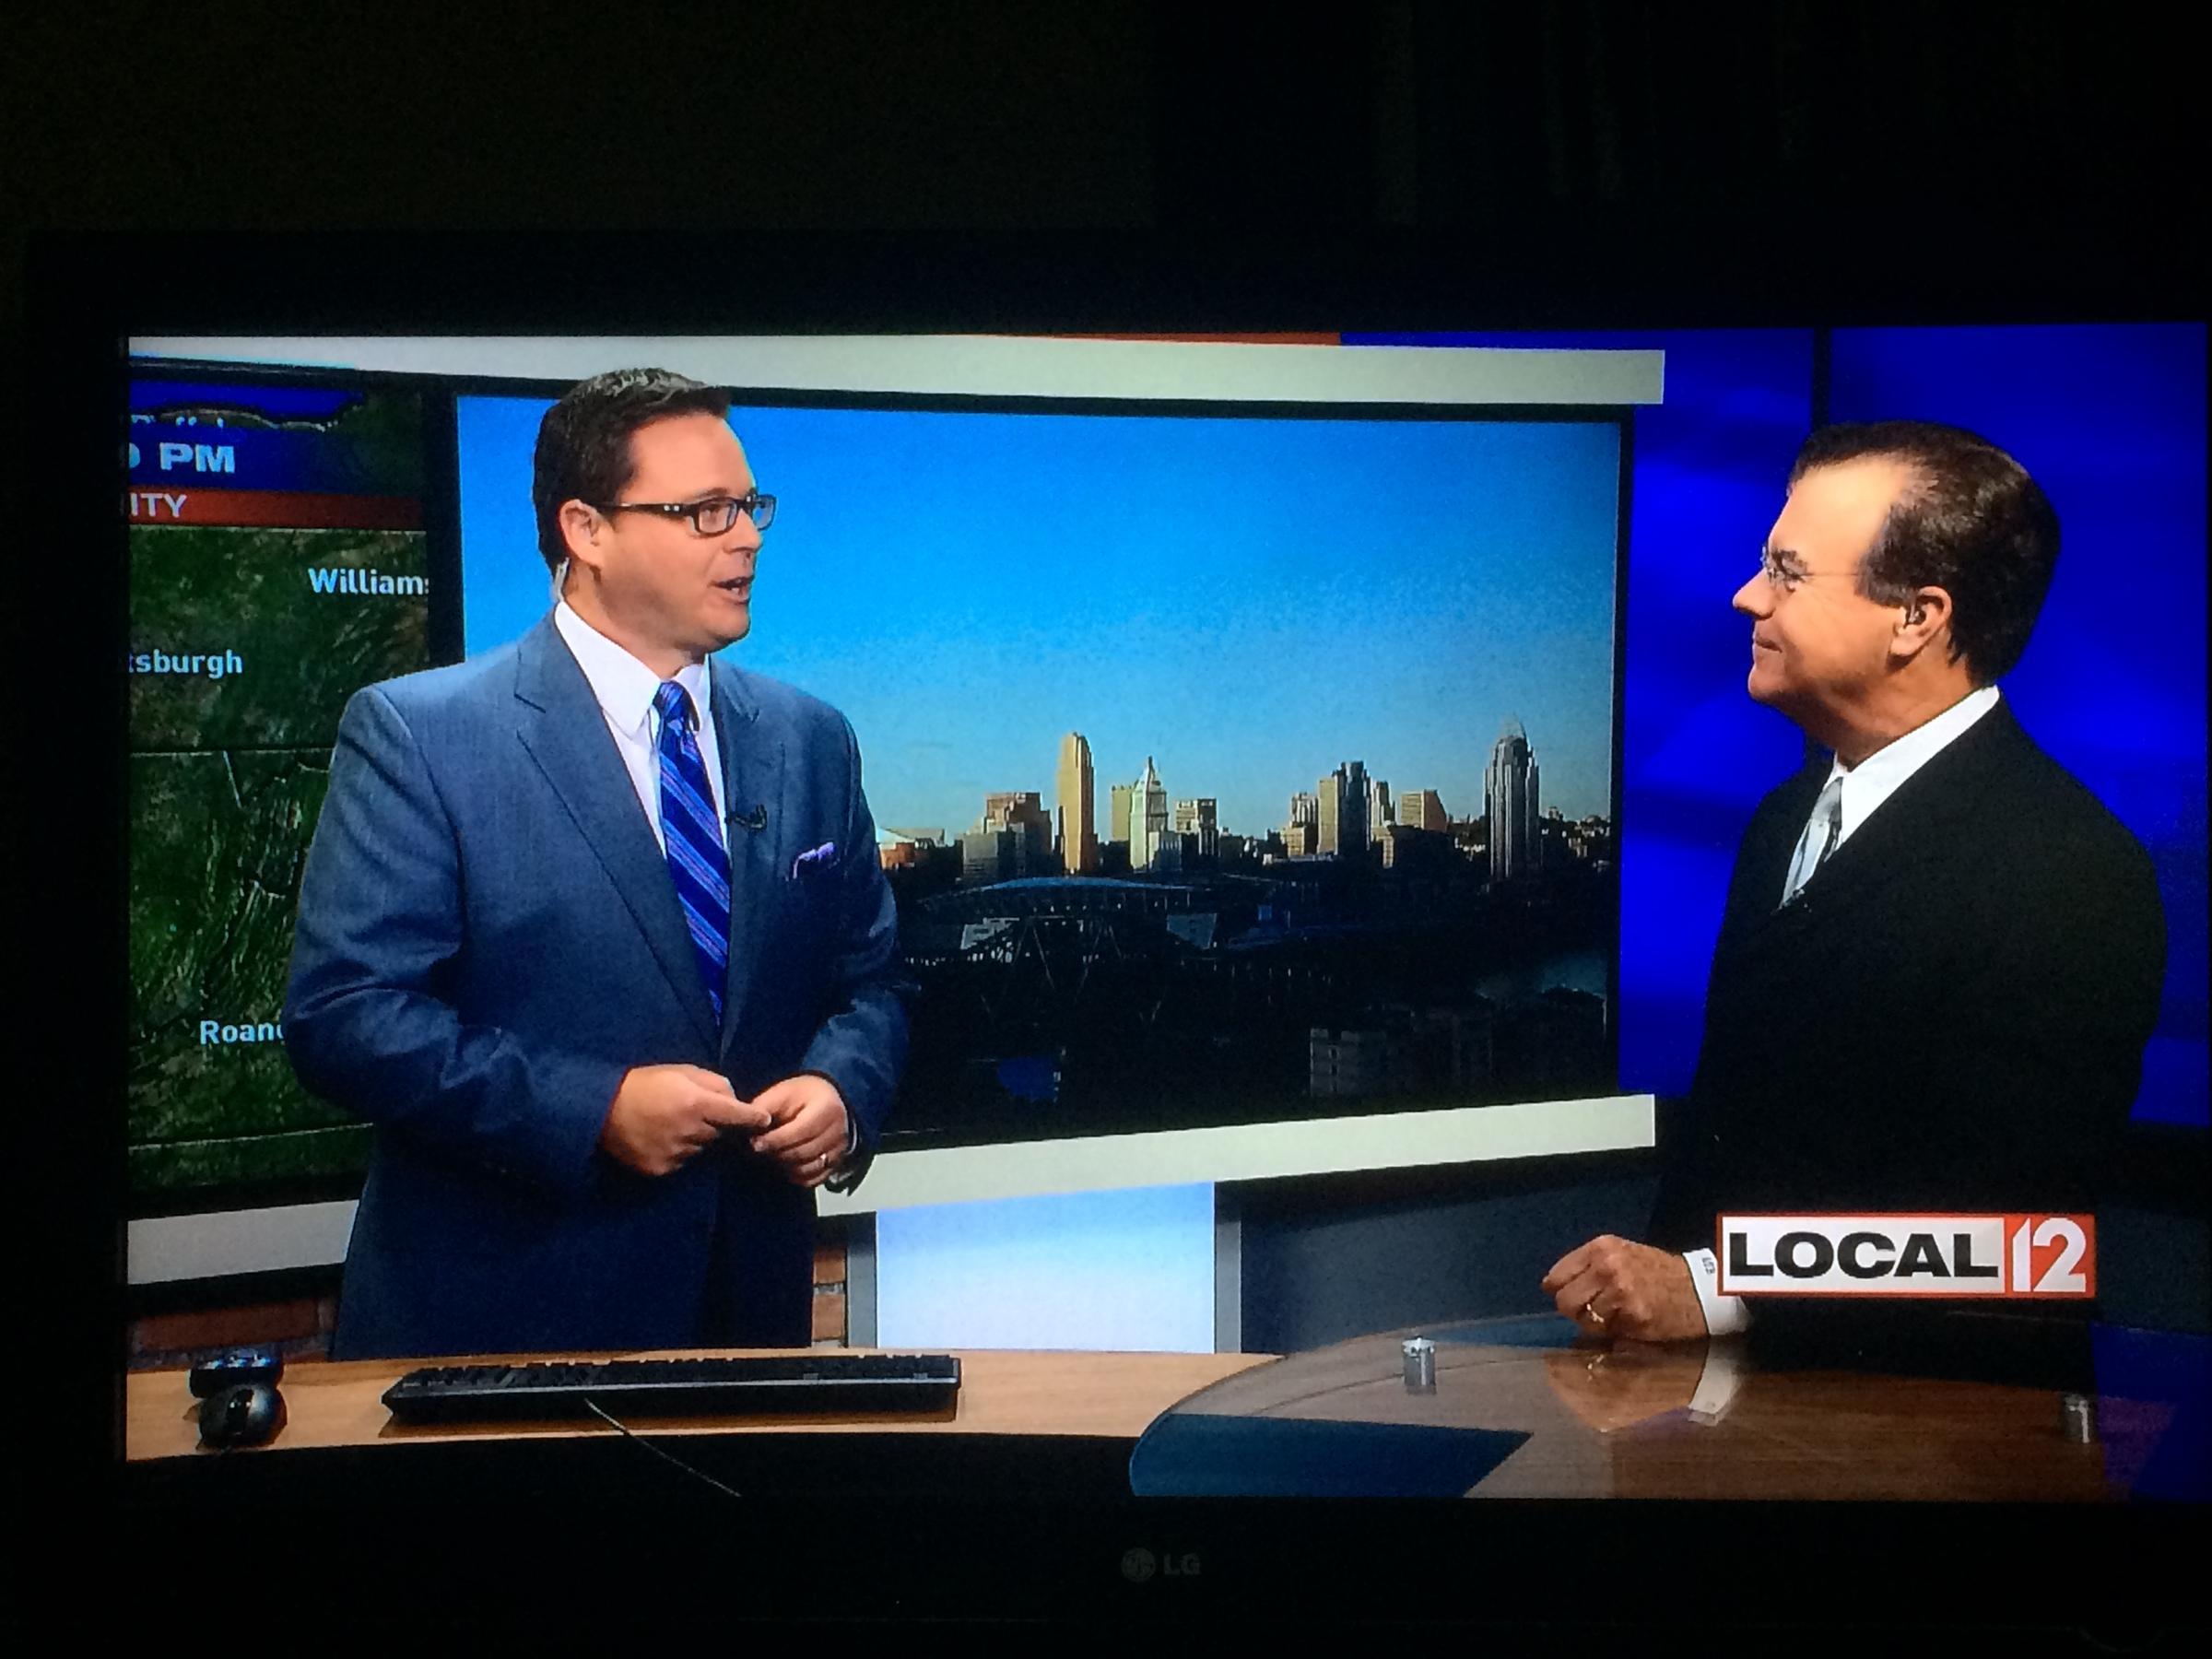 WKRC-TV Hires New Meteorologist, Moves John Gumm To Nights